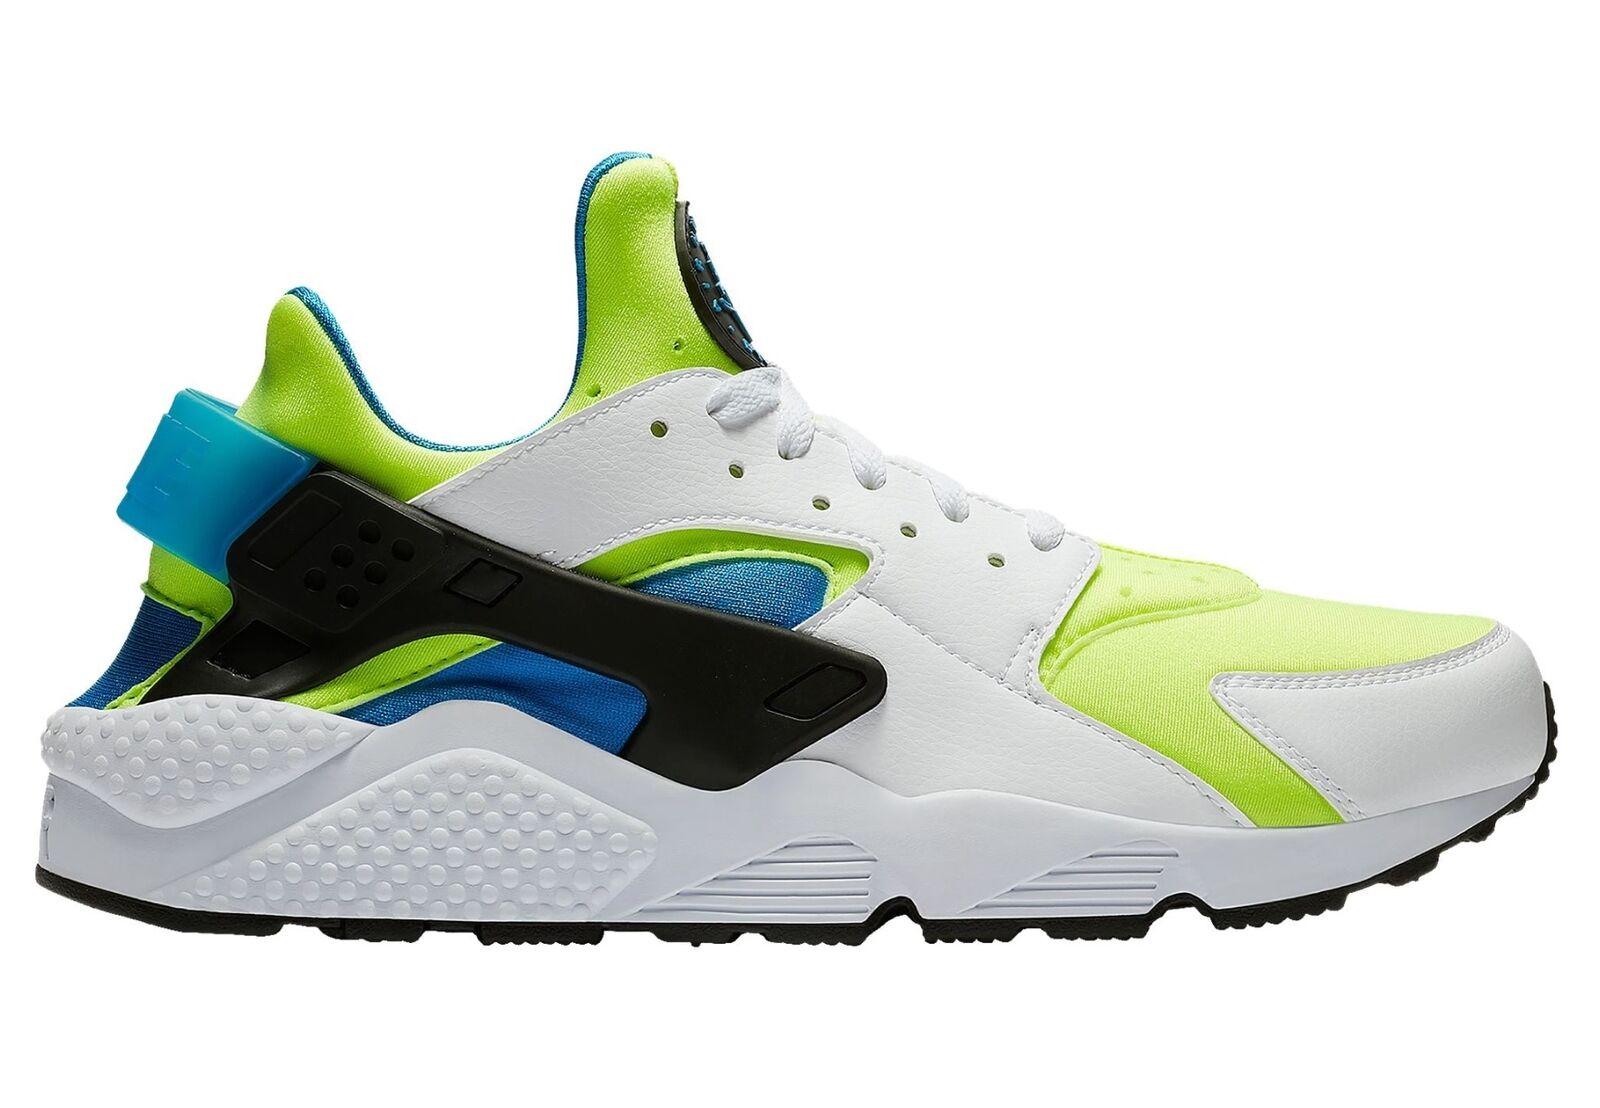 Nike Air huarache se grito Verde Hombre at4254-101 talla Blanco Volt Azul Zapatos talla at4254-101 9,5 759daf